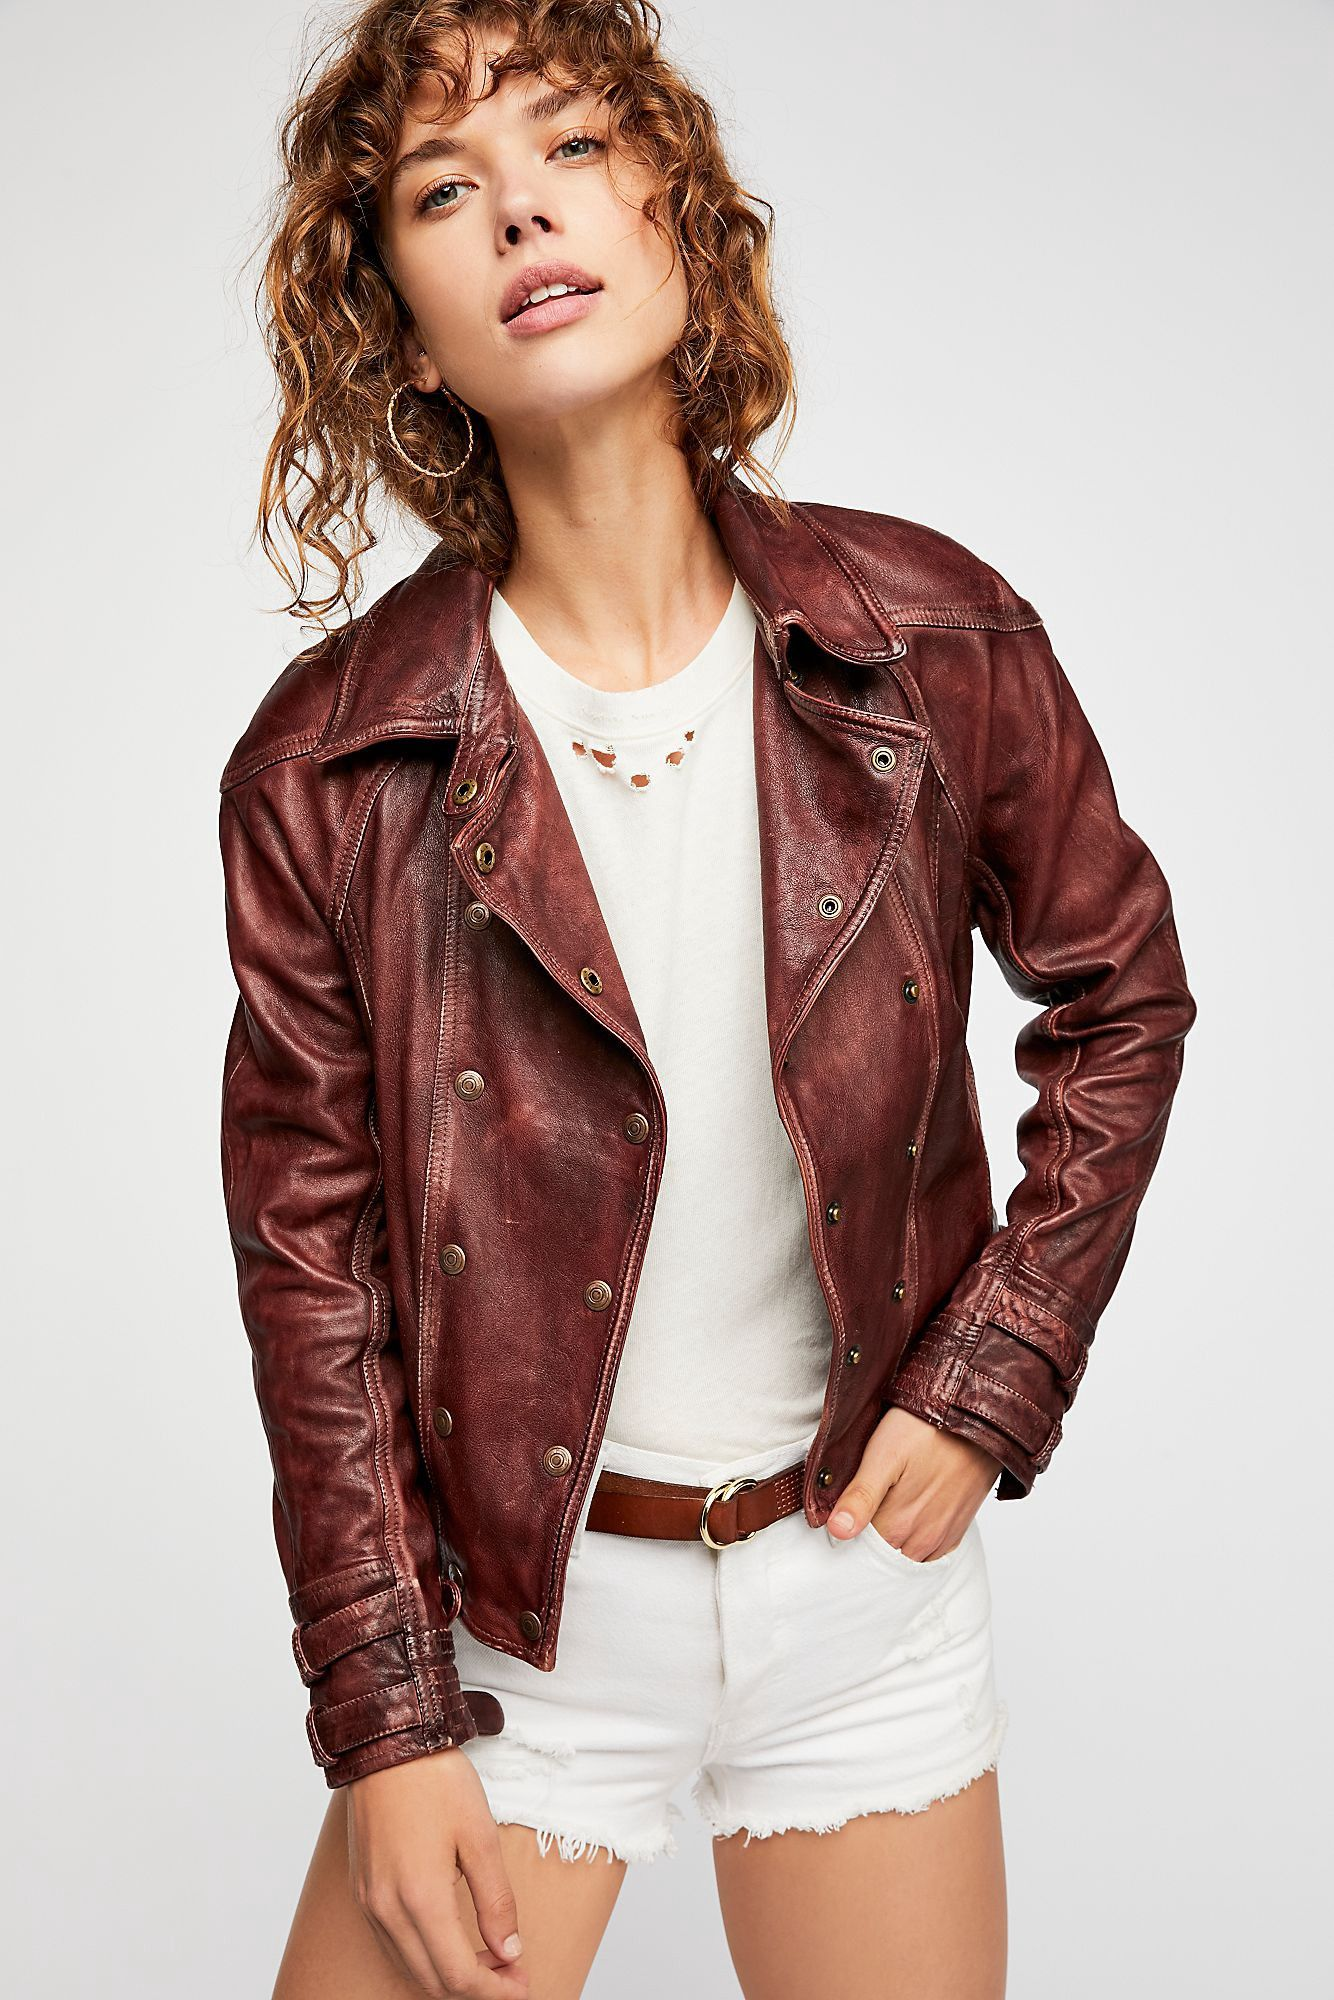 Free People Avis Leather Jacket Dusty Brown Xs Leather